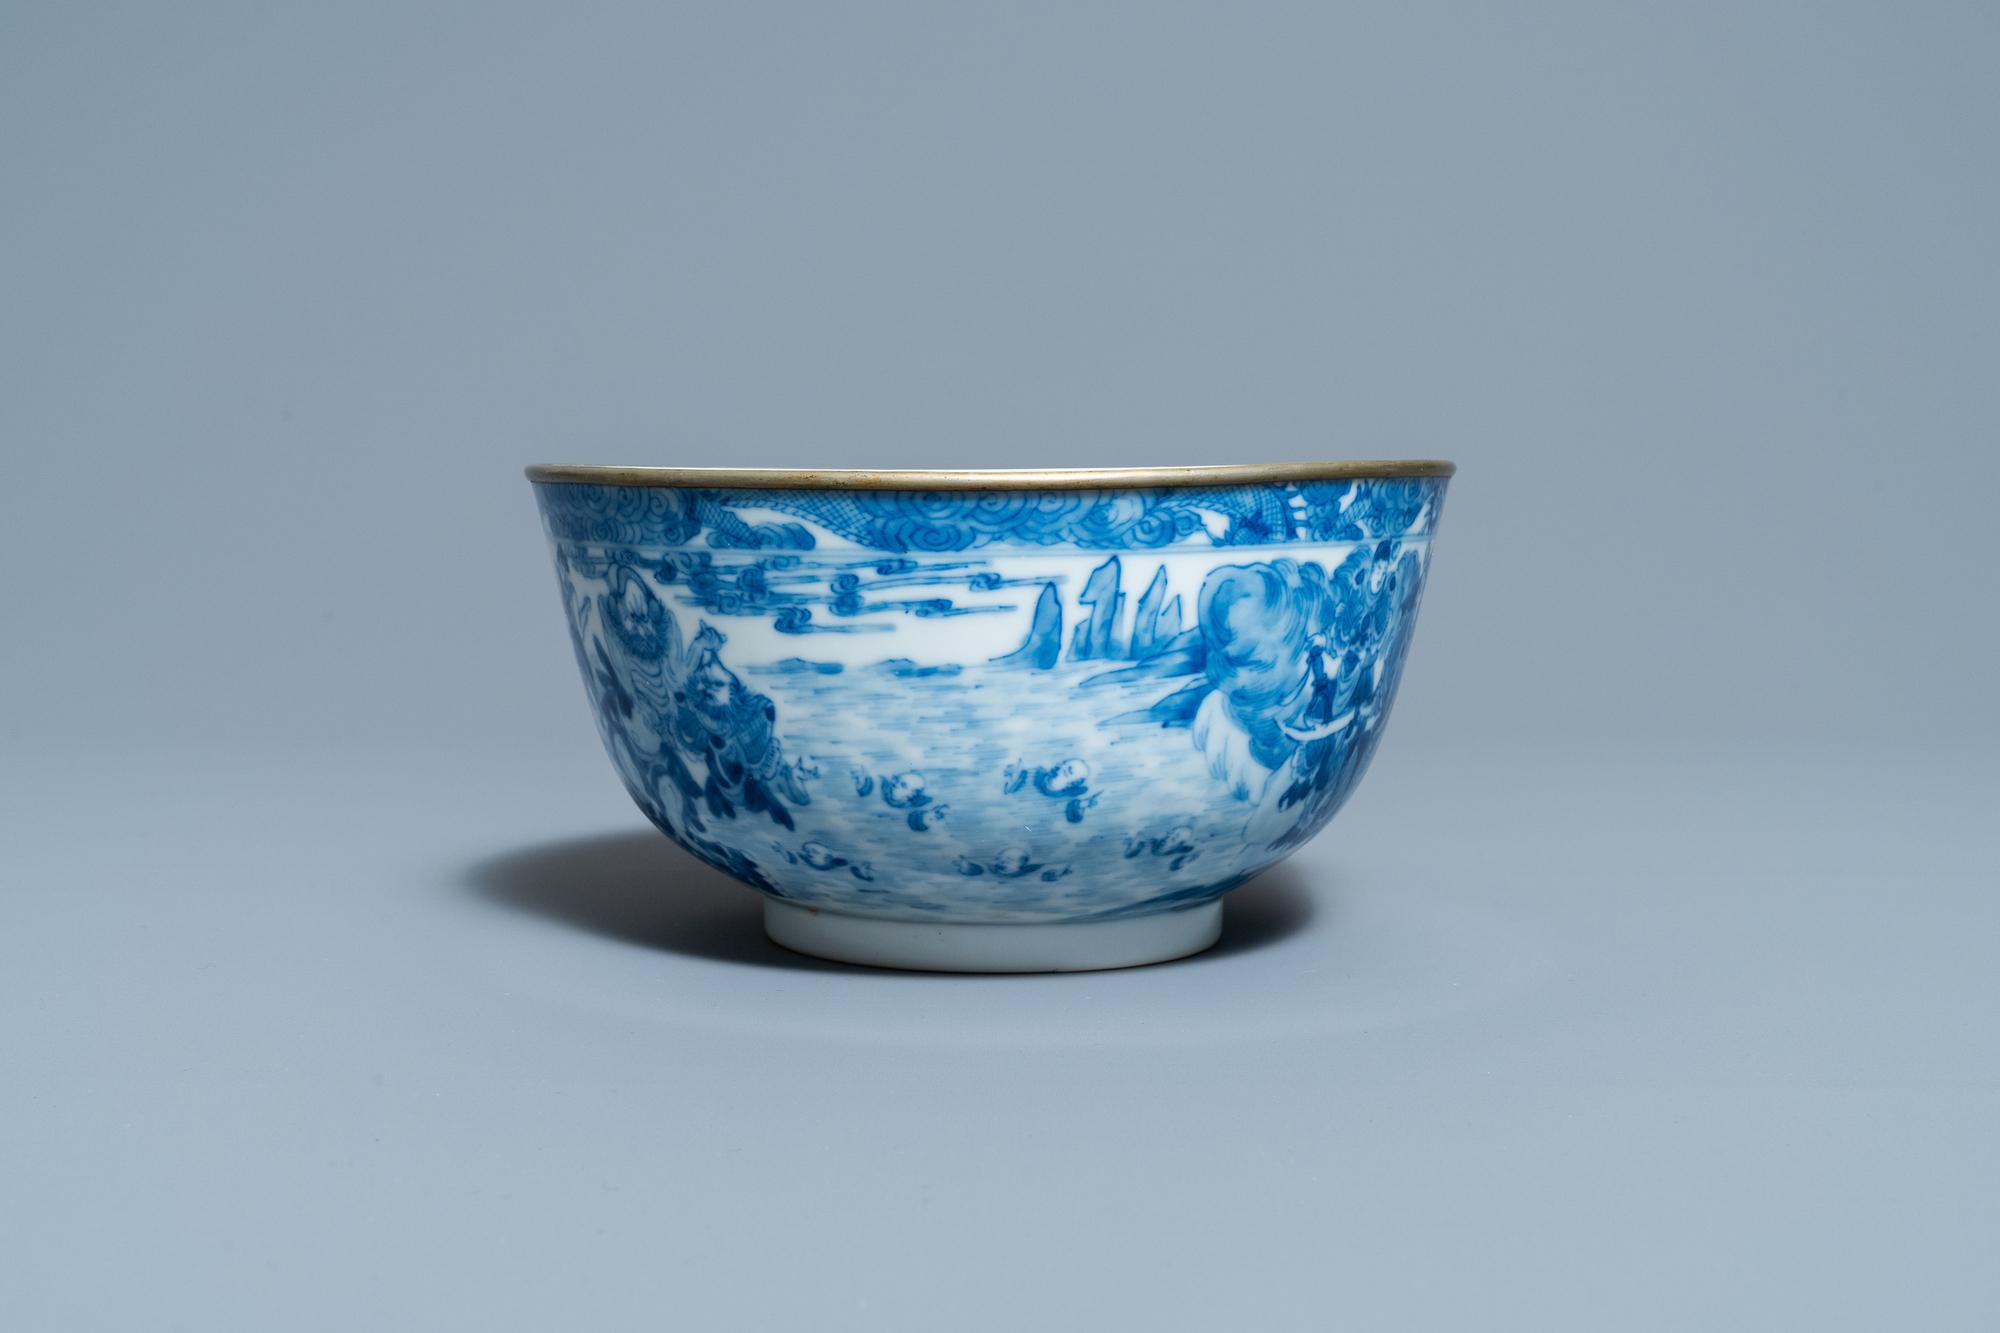 A Chinese blue and white Vietnamese market 'Bleu de Hue' bowl, Kangxi mark, 19th C. - Image 5 of 7